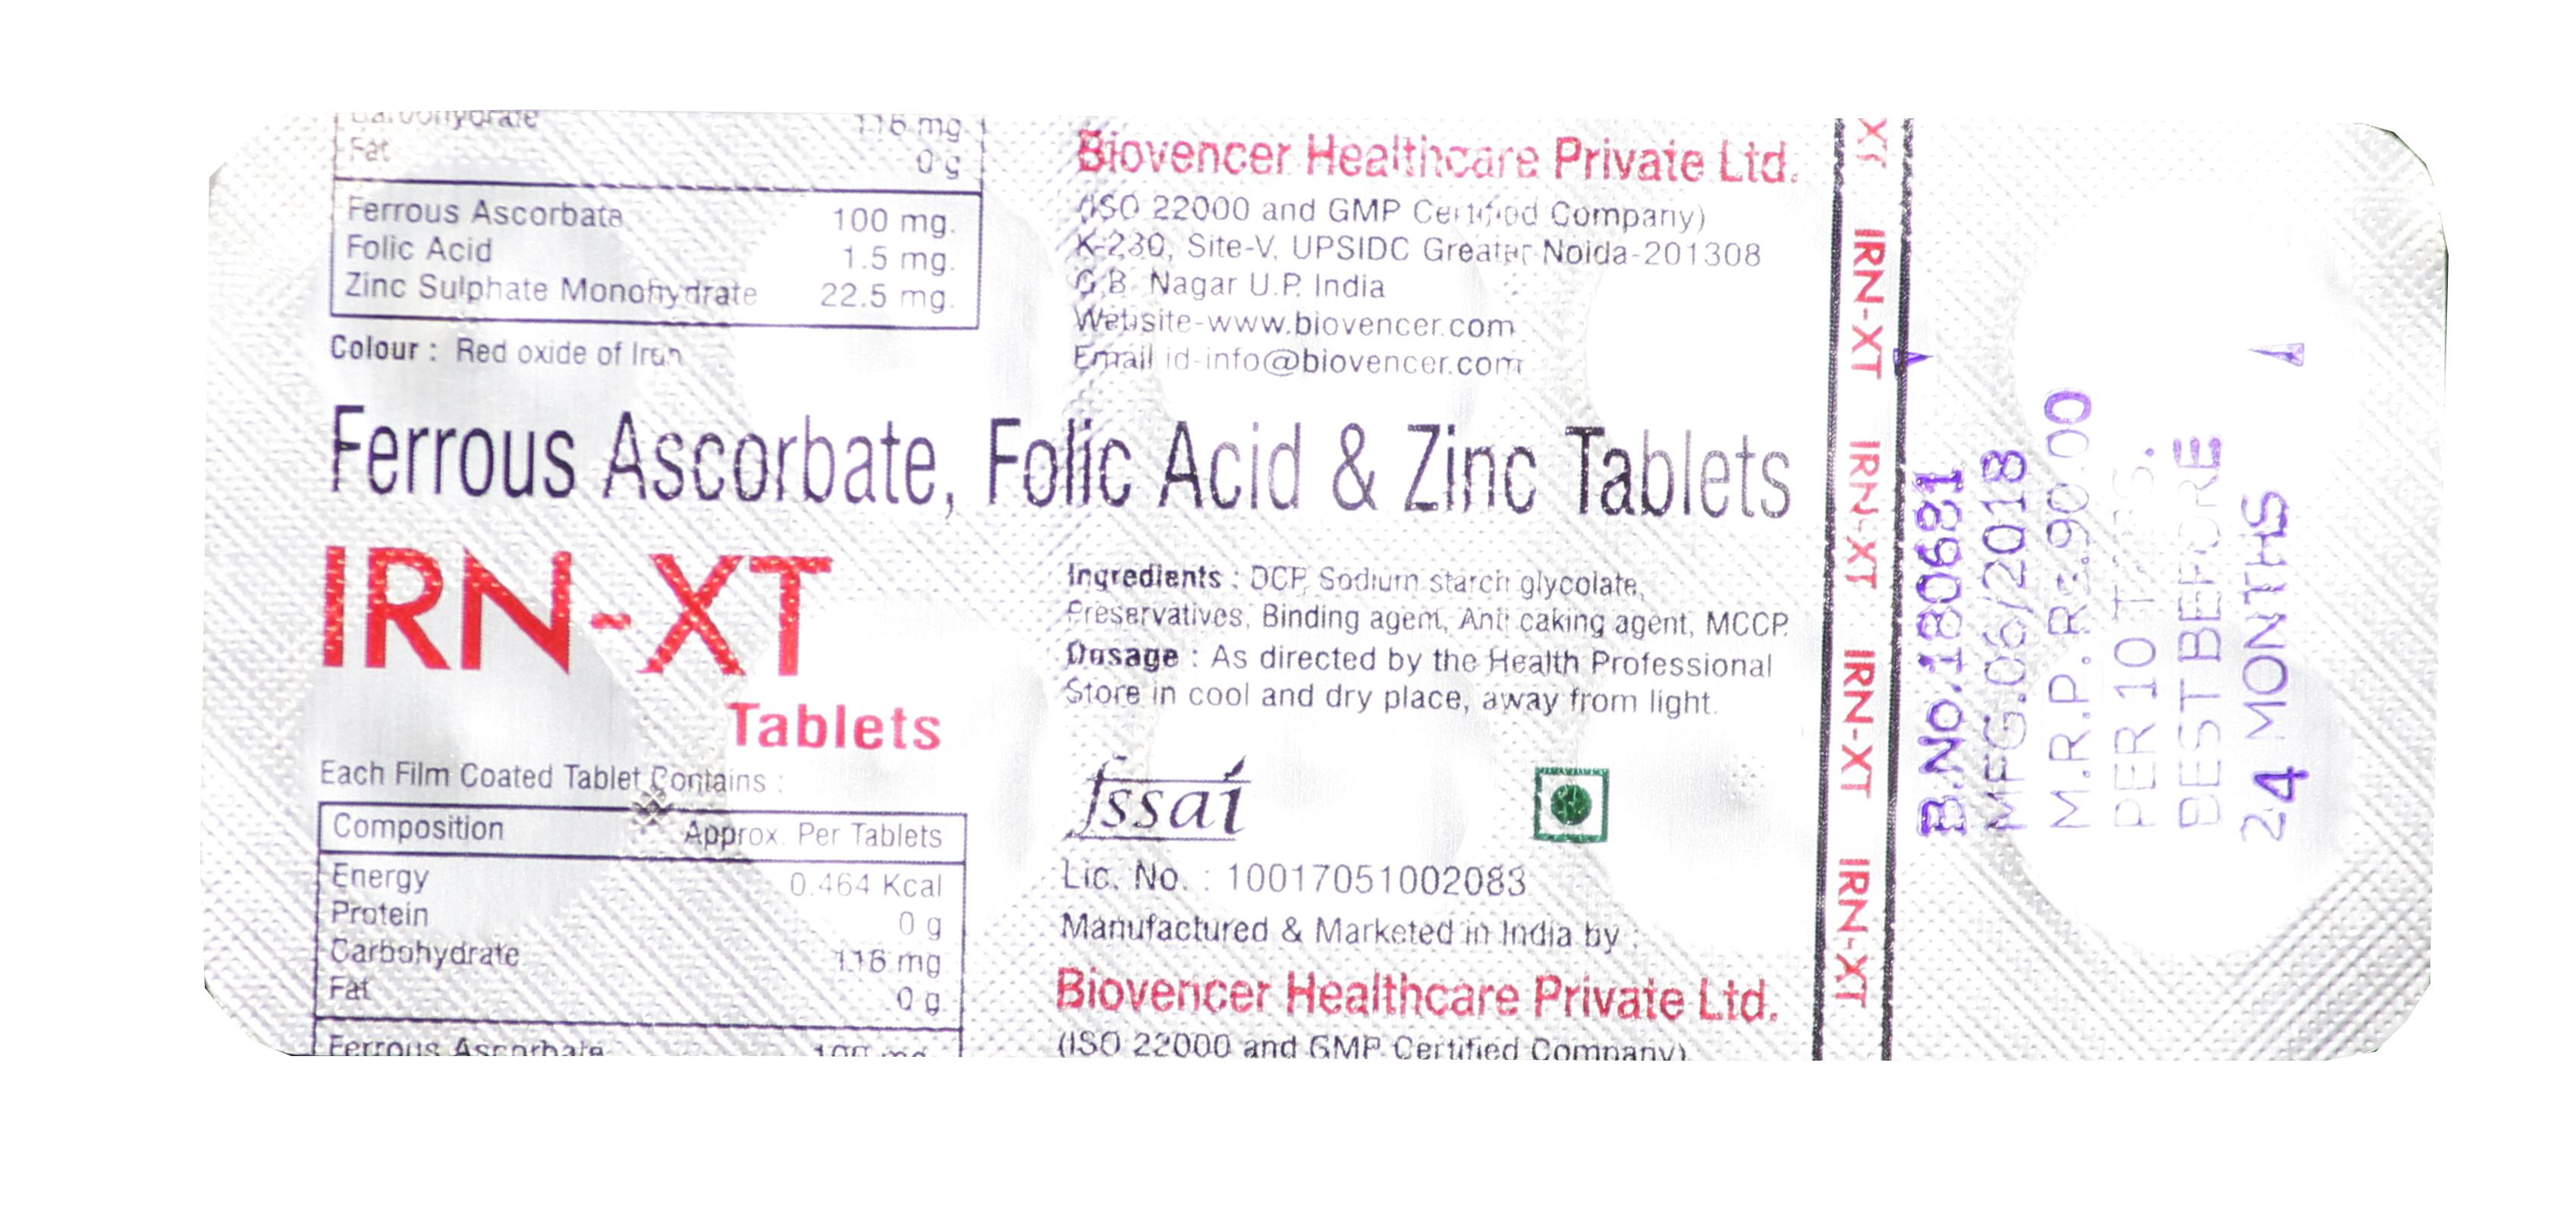 Ferrous Ascorbate Folic Acid Zinc Tablet